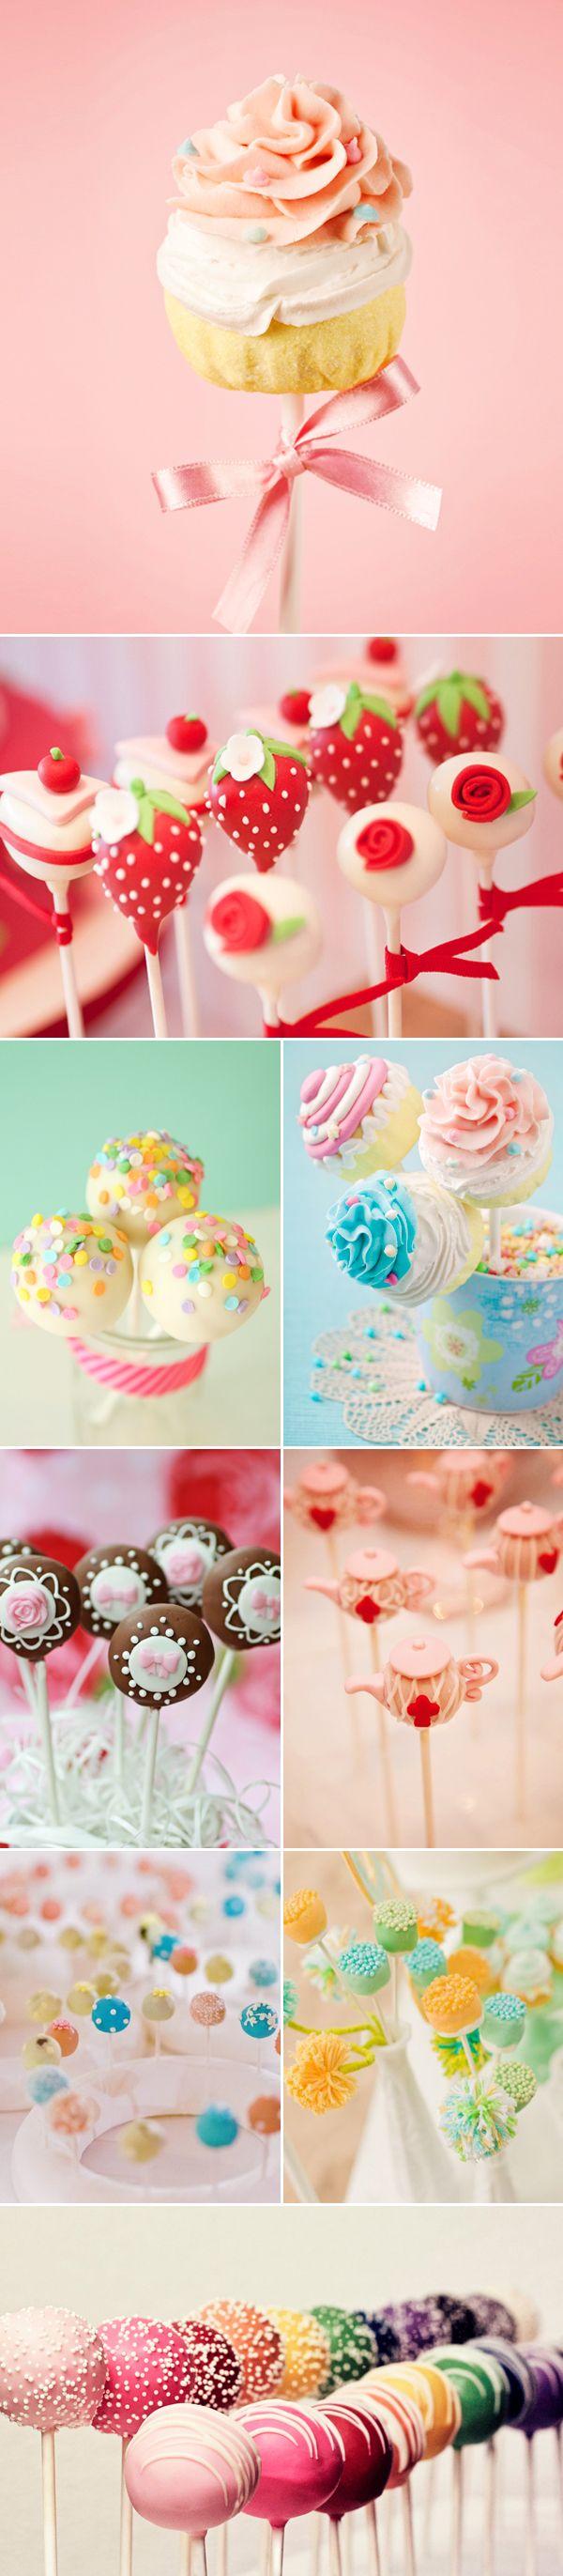 19 Lovely Cakepop Designs  – Recipes